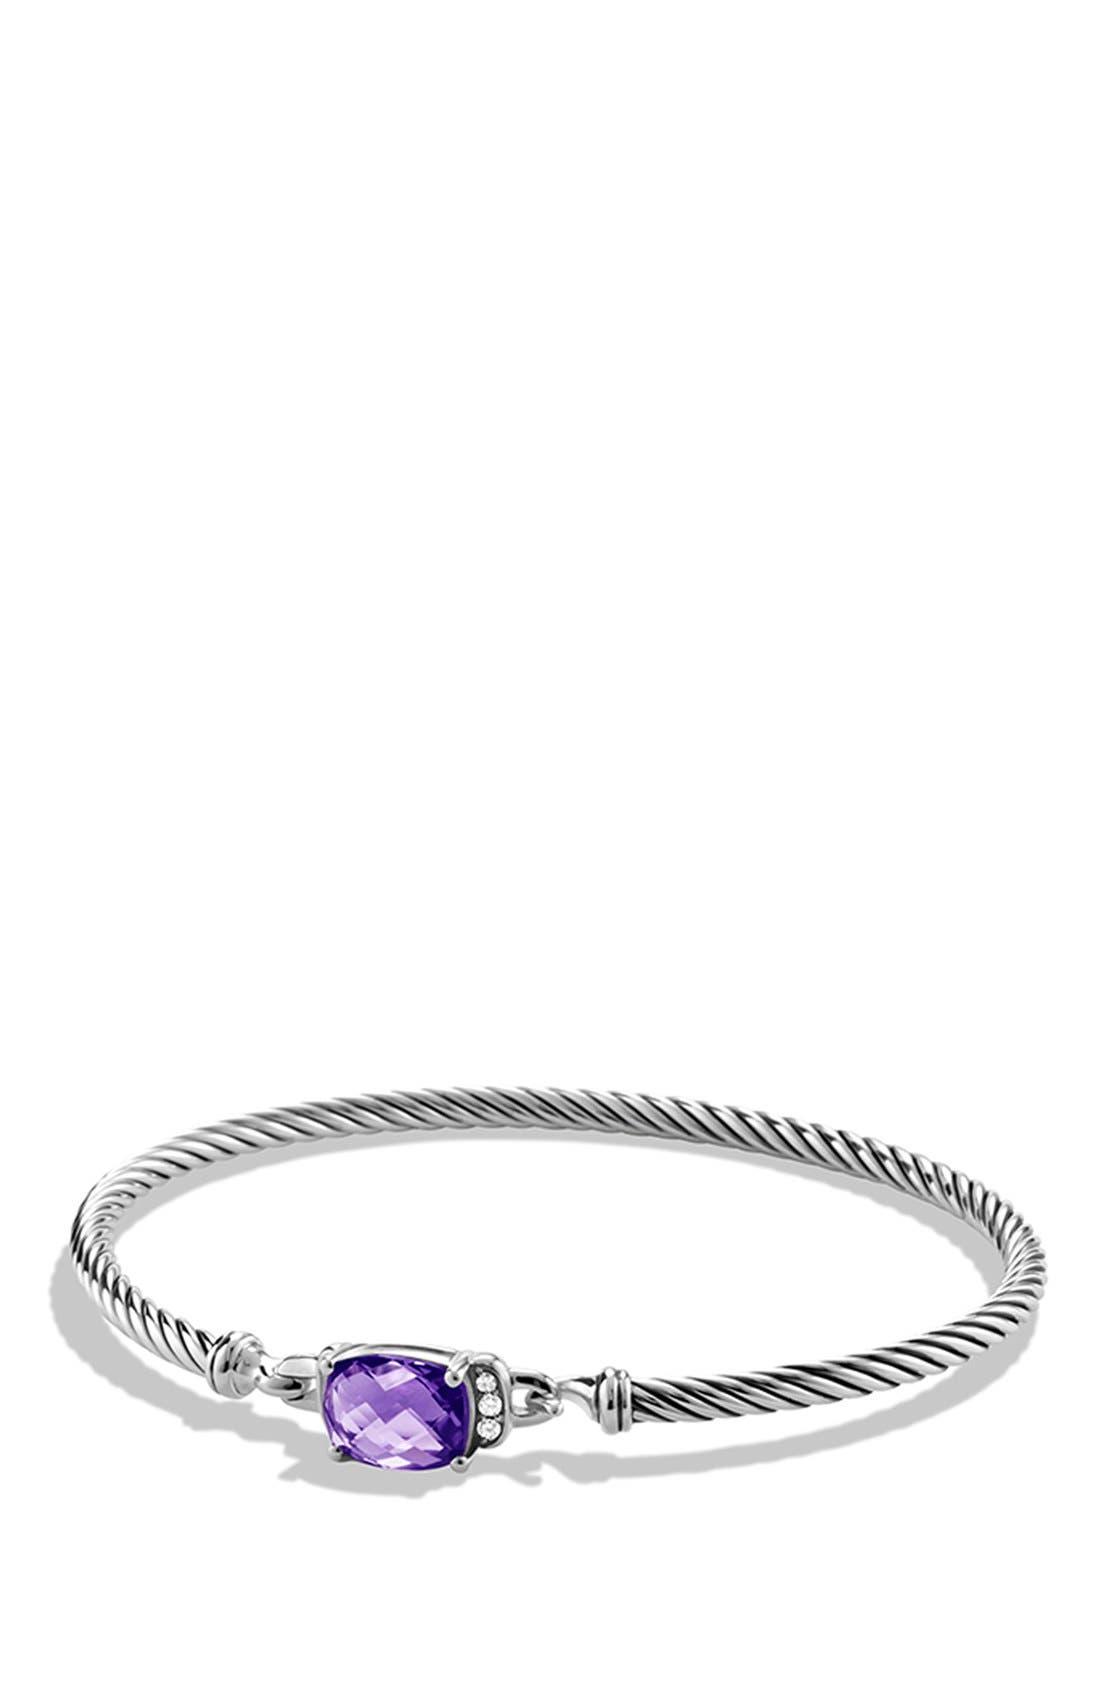 'Petite Wheaton' Bracelet with Semiprecious Stone & Diamonds,                             Main thumbnail 1, color,                             AMETHYST